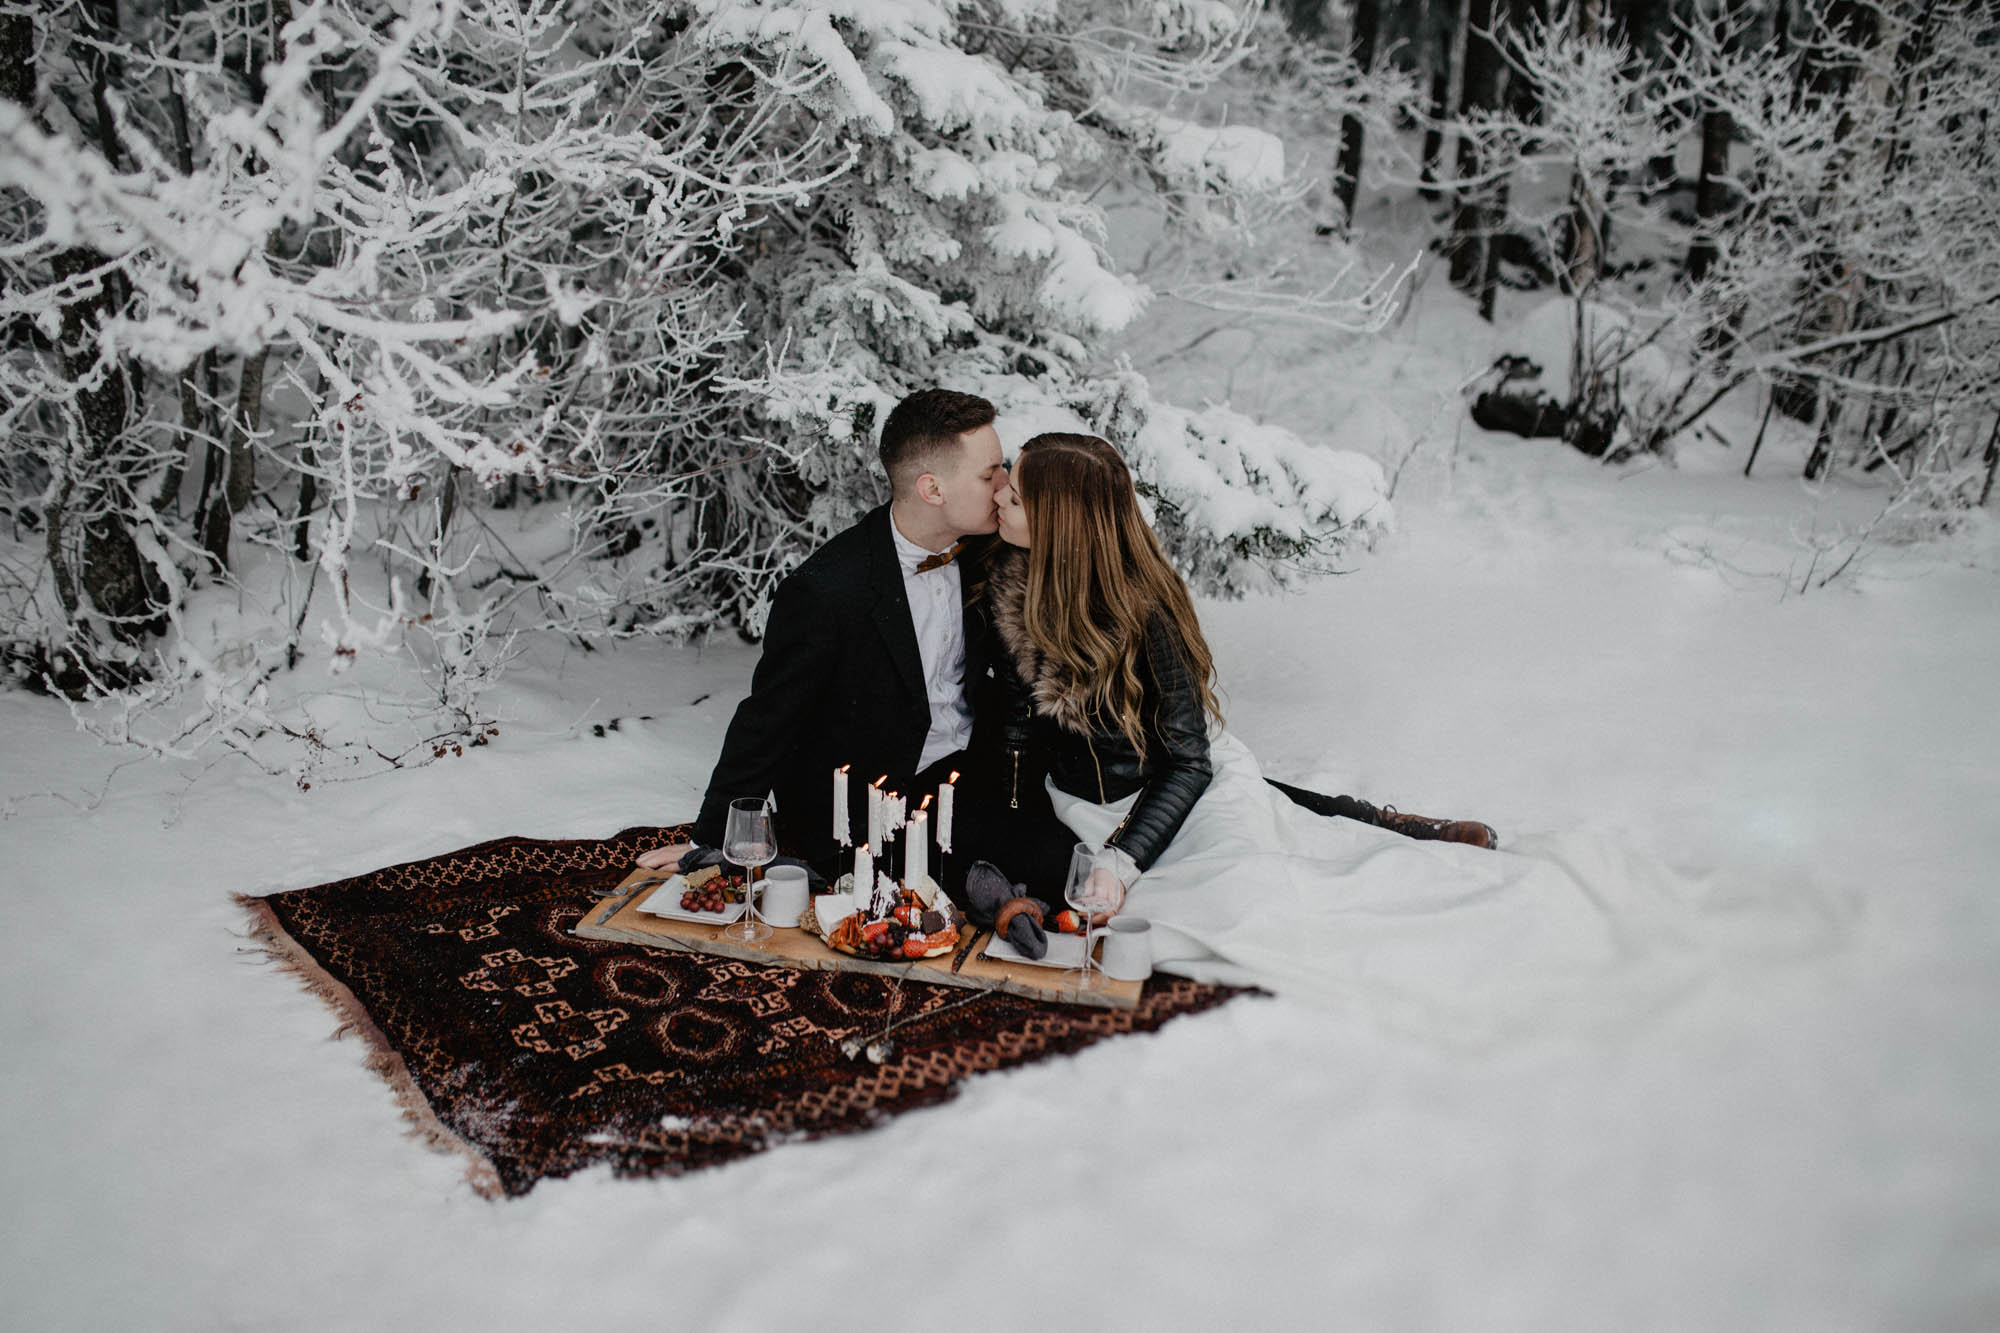 ashley_schulman_photography-winter_wedding_tampere-61.jpg